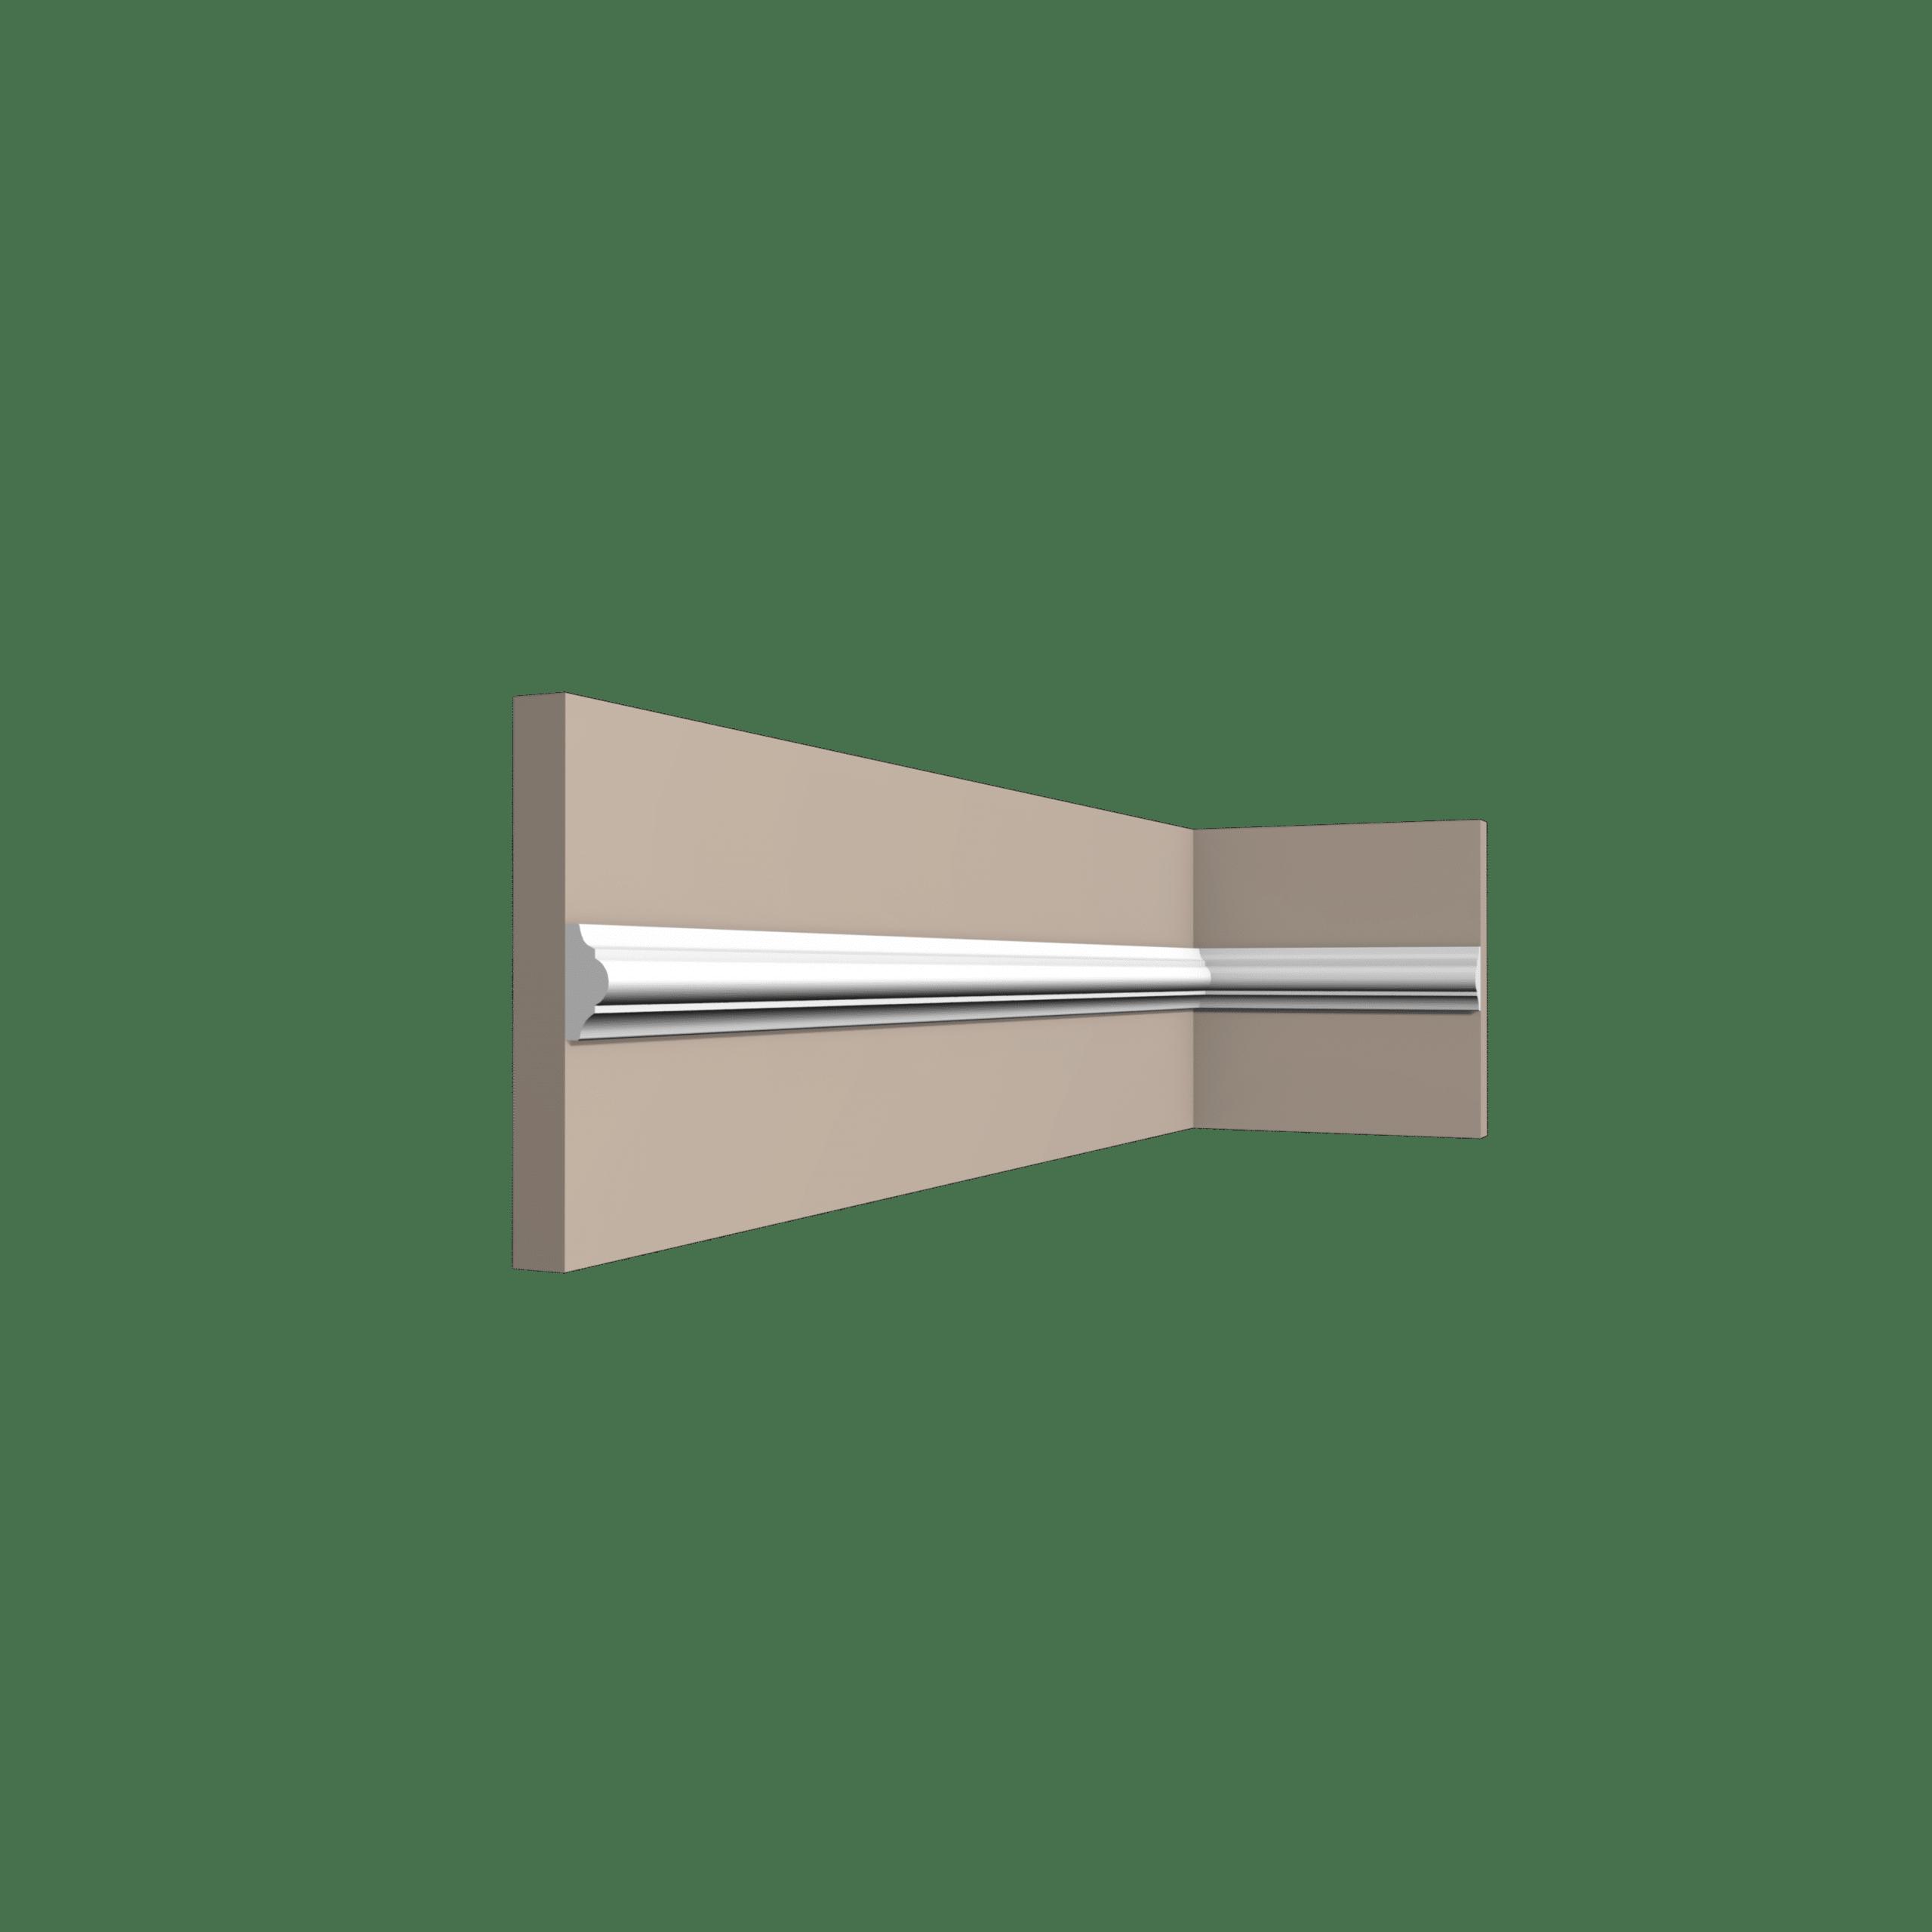 קרניז פוליאוריתן דגם DS - 2508